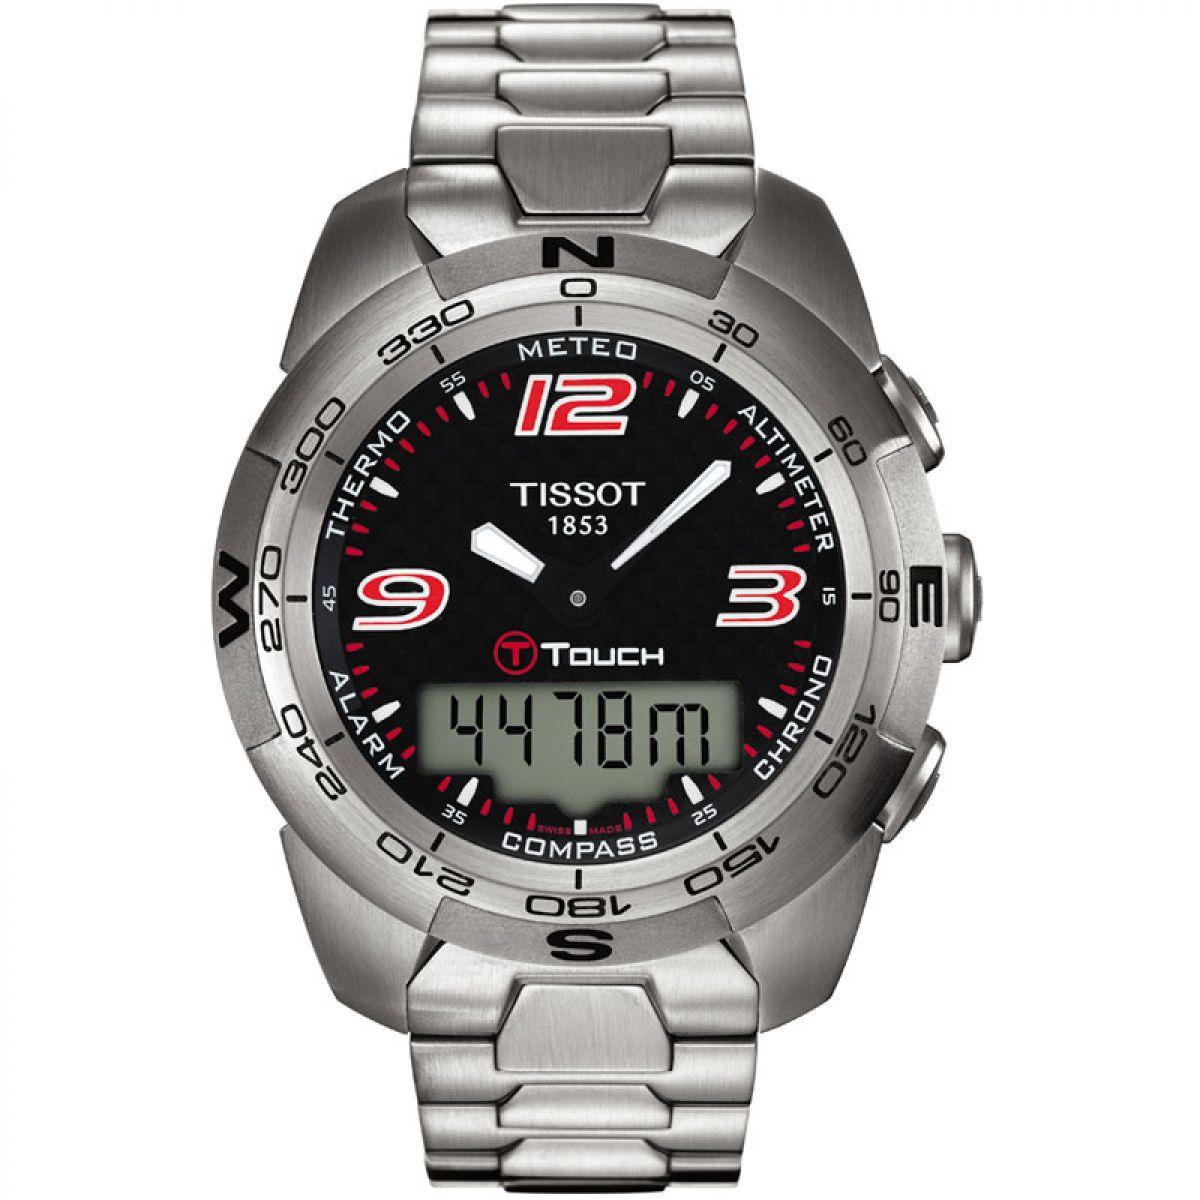 gents tissot t touch expert alarm chronograph watch t0134201105700 rh watchshop com tissot t touch expert solar user guide tissot t-touch expert titanium user manual